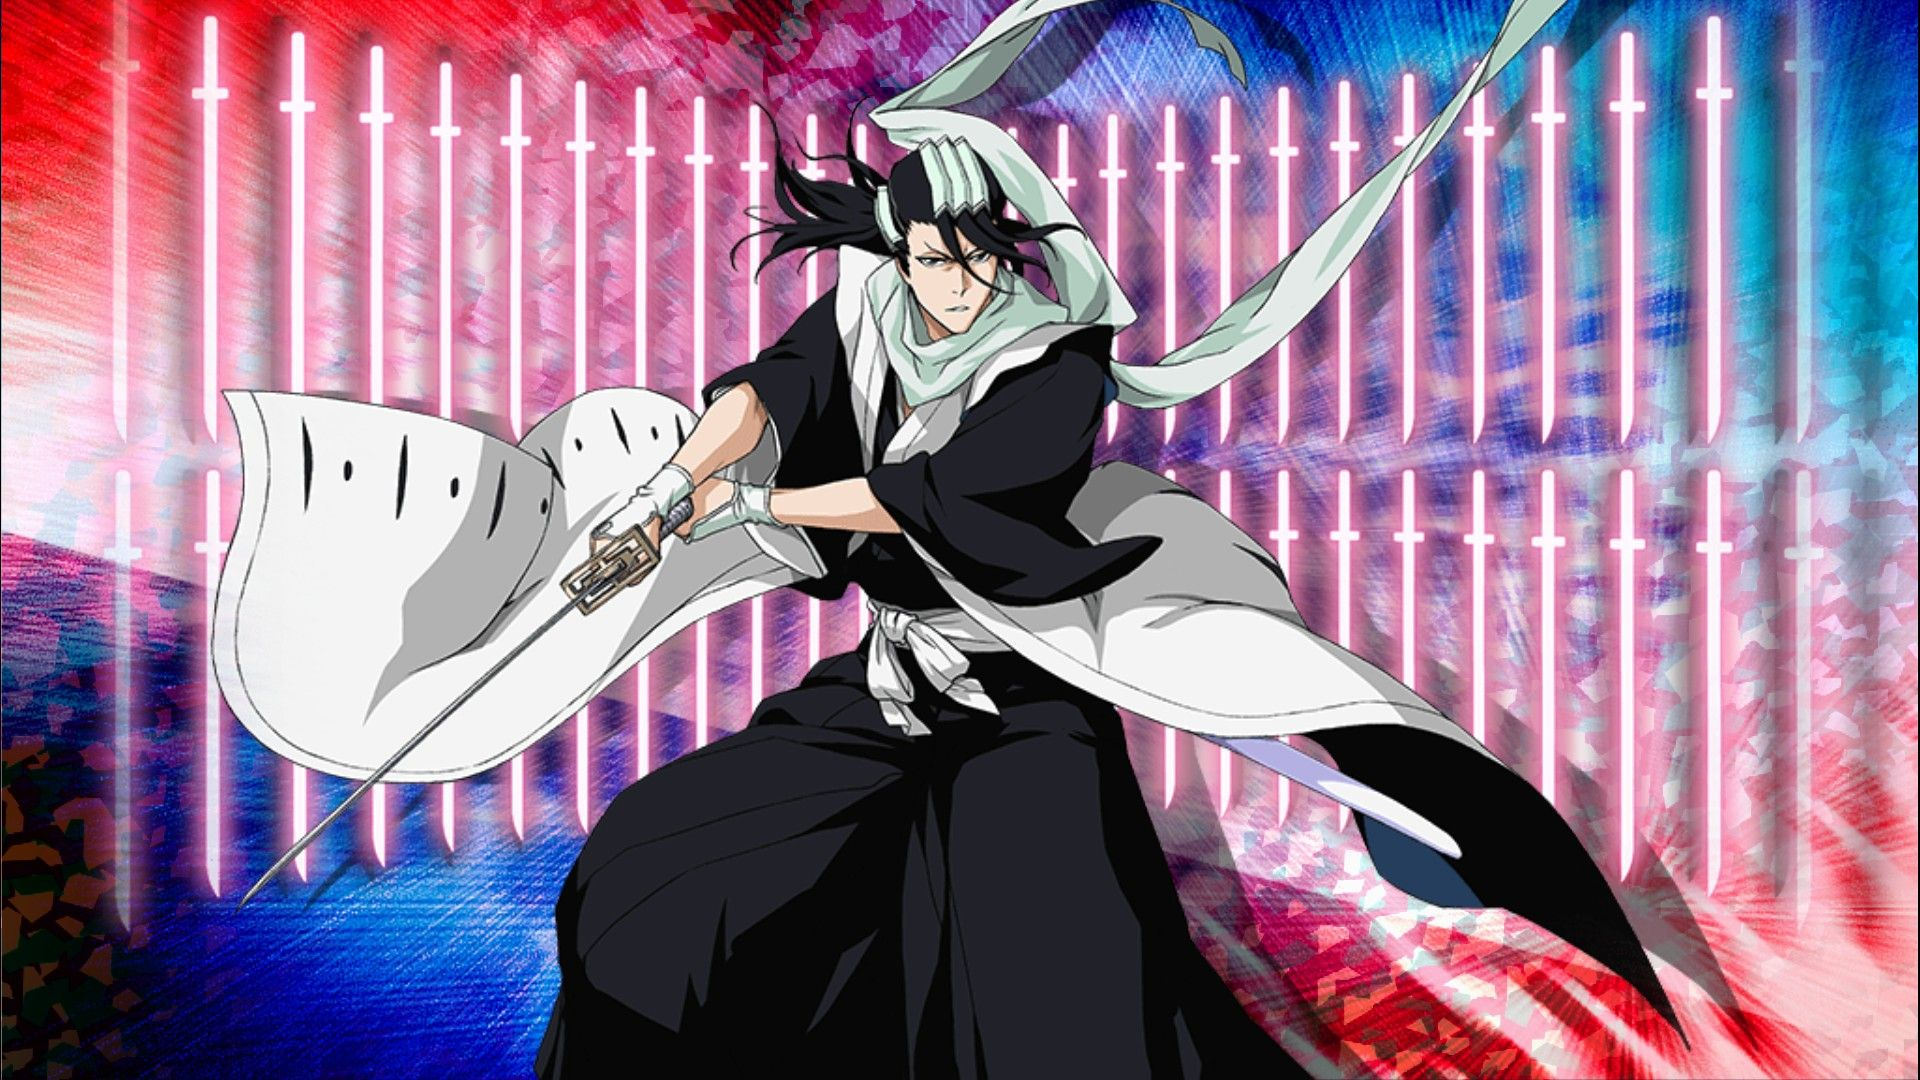 Byakuya's Bankai Senbonzakura Kageyoshi